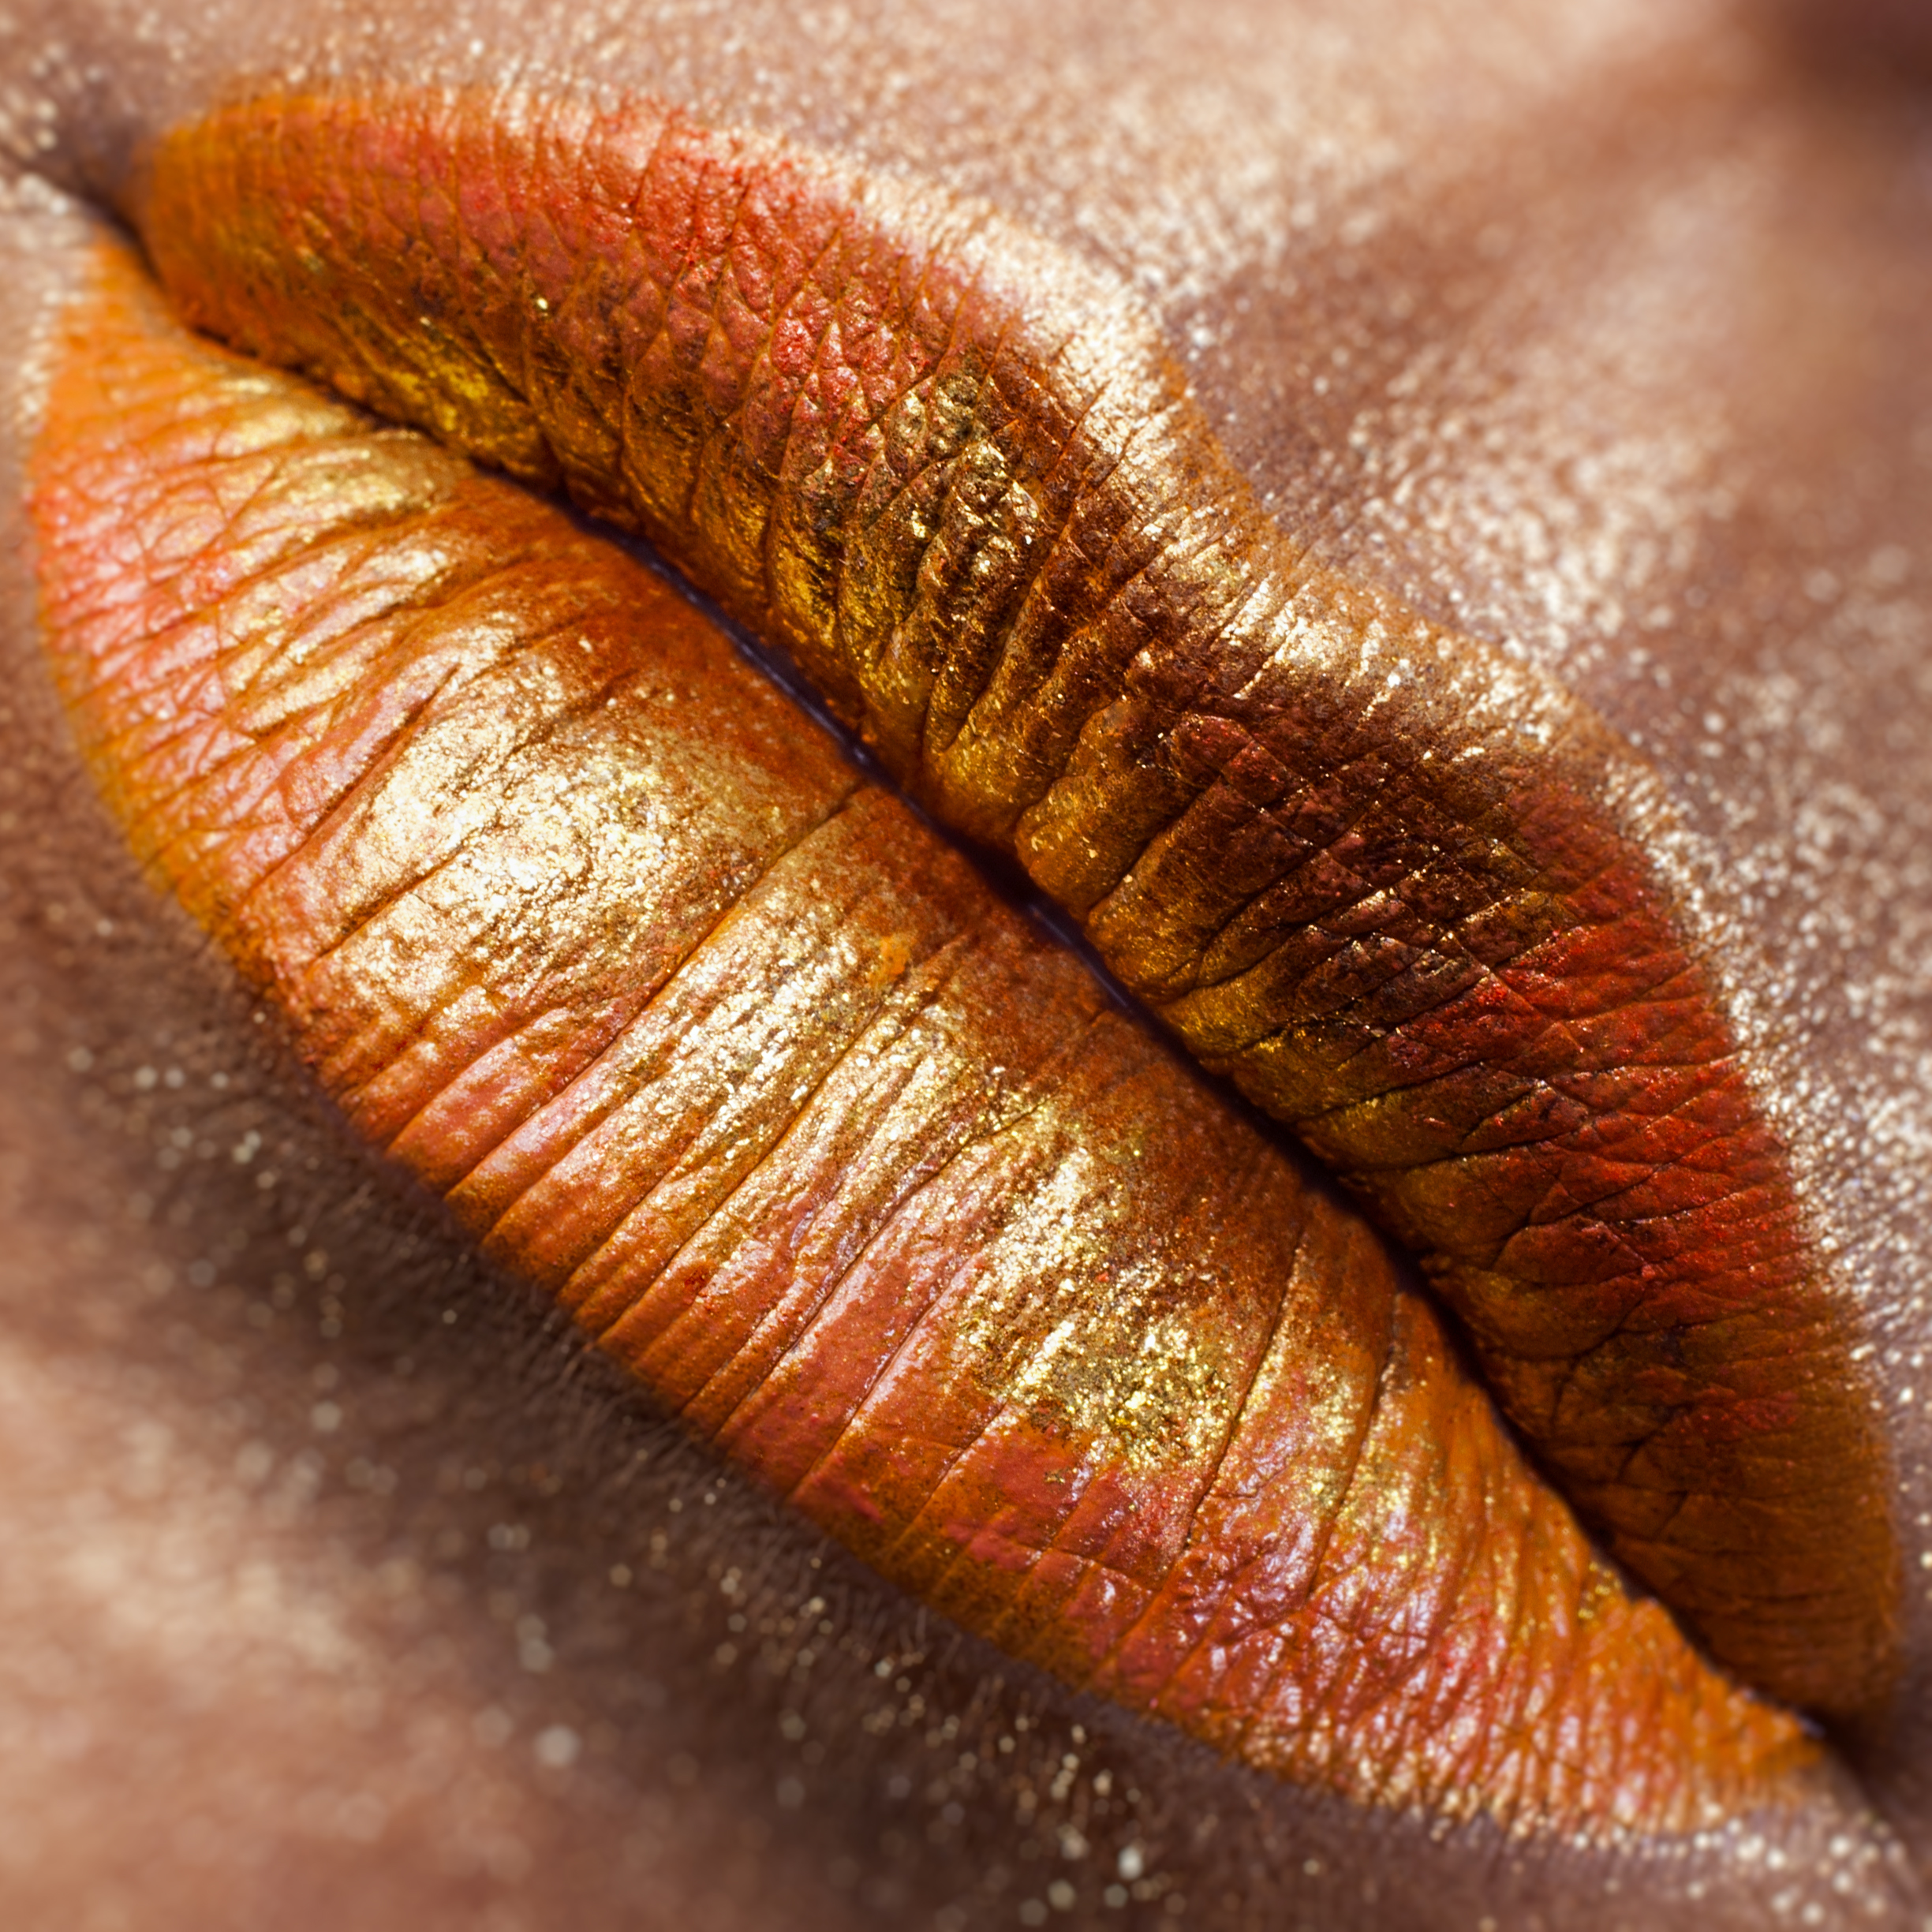 ALORA 010 - A bright zing of citrus zest, optimistic as a traveler at the start of a long journey; tangerine naiveté.